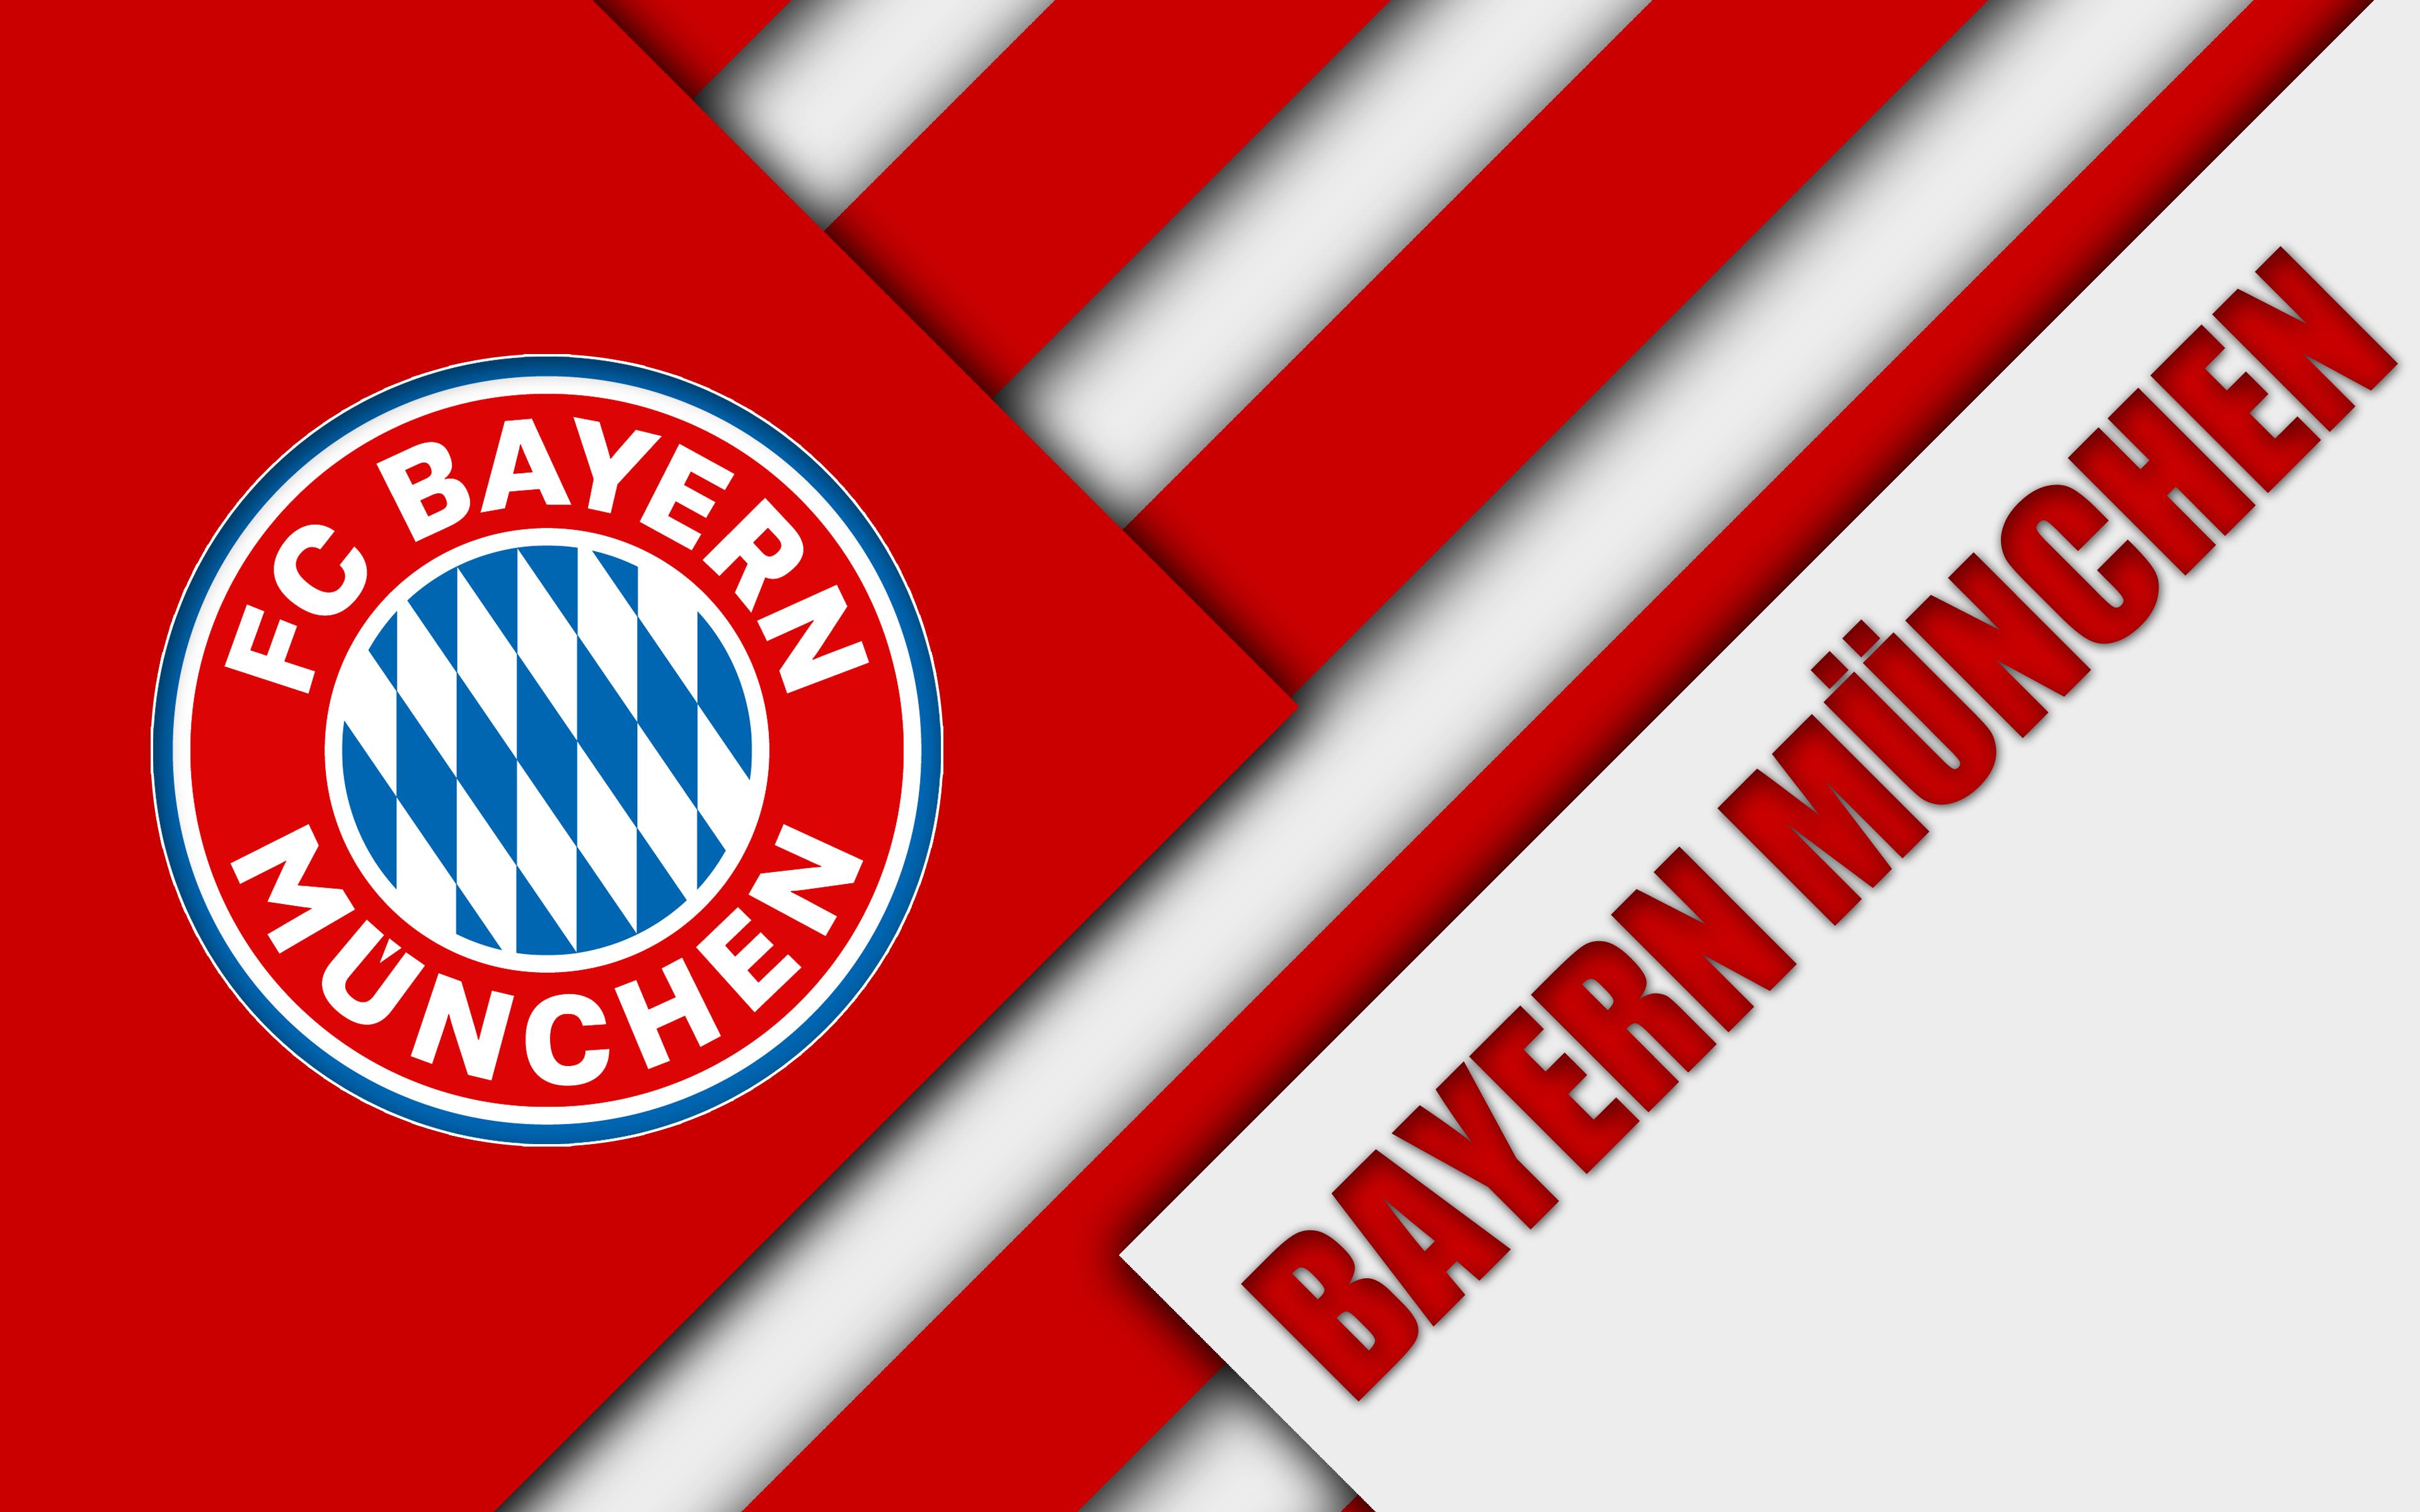 Bayern Munchen Football Club Wallpaper: FC Bayern Munich 4k Ultra HD Wallpaper